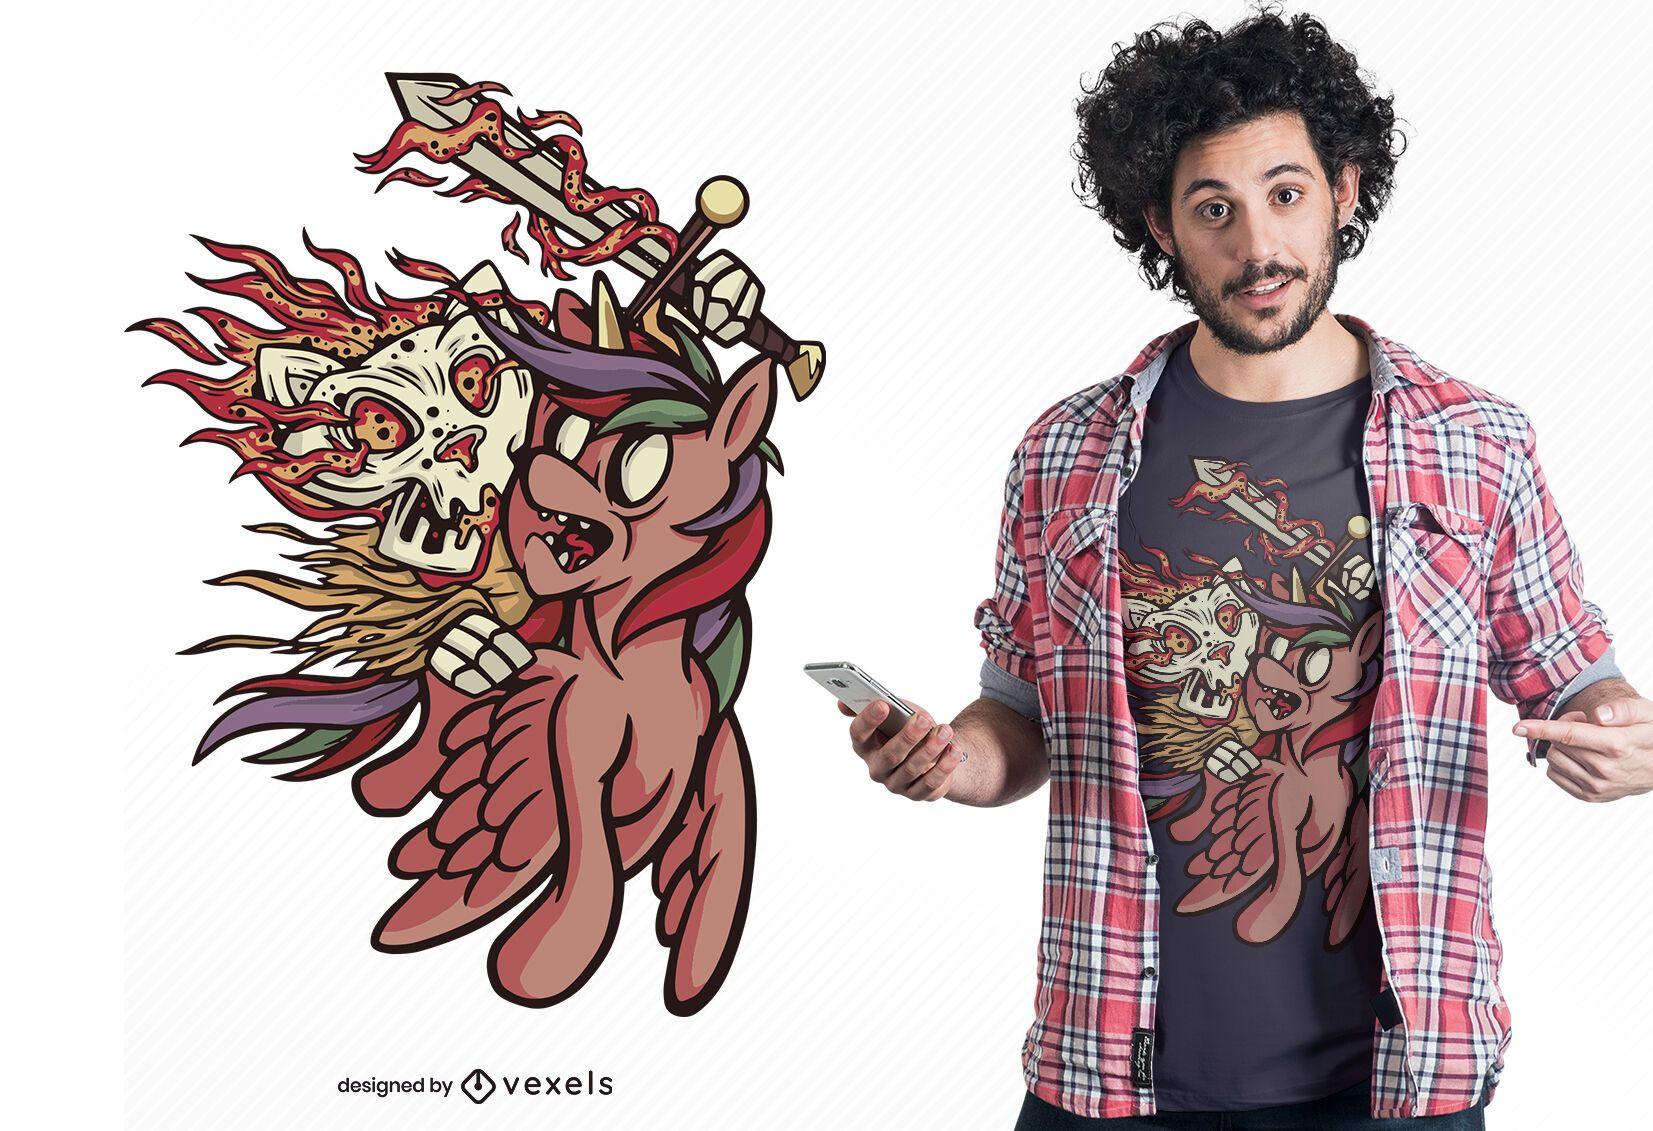 War apocalypse horsecat t-shirt design